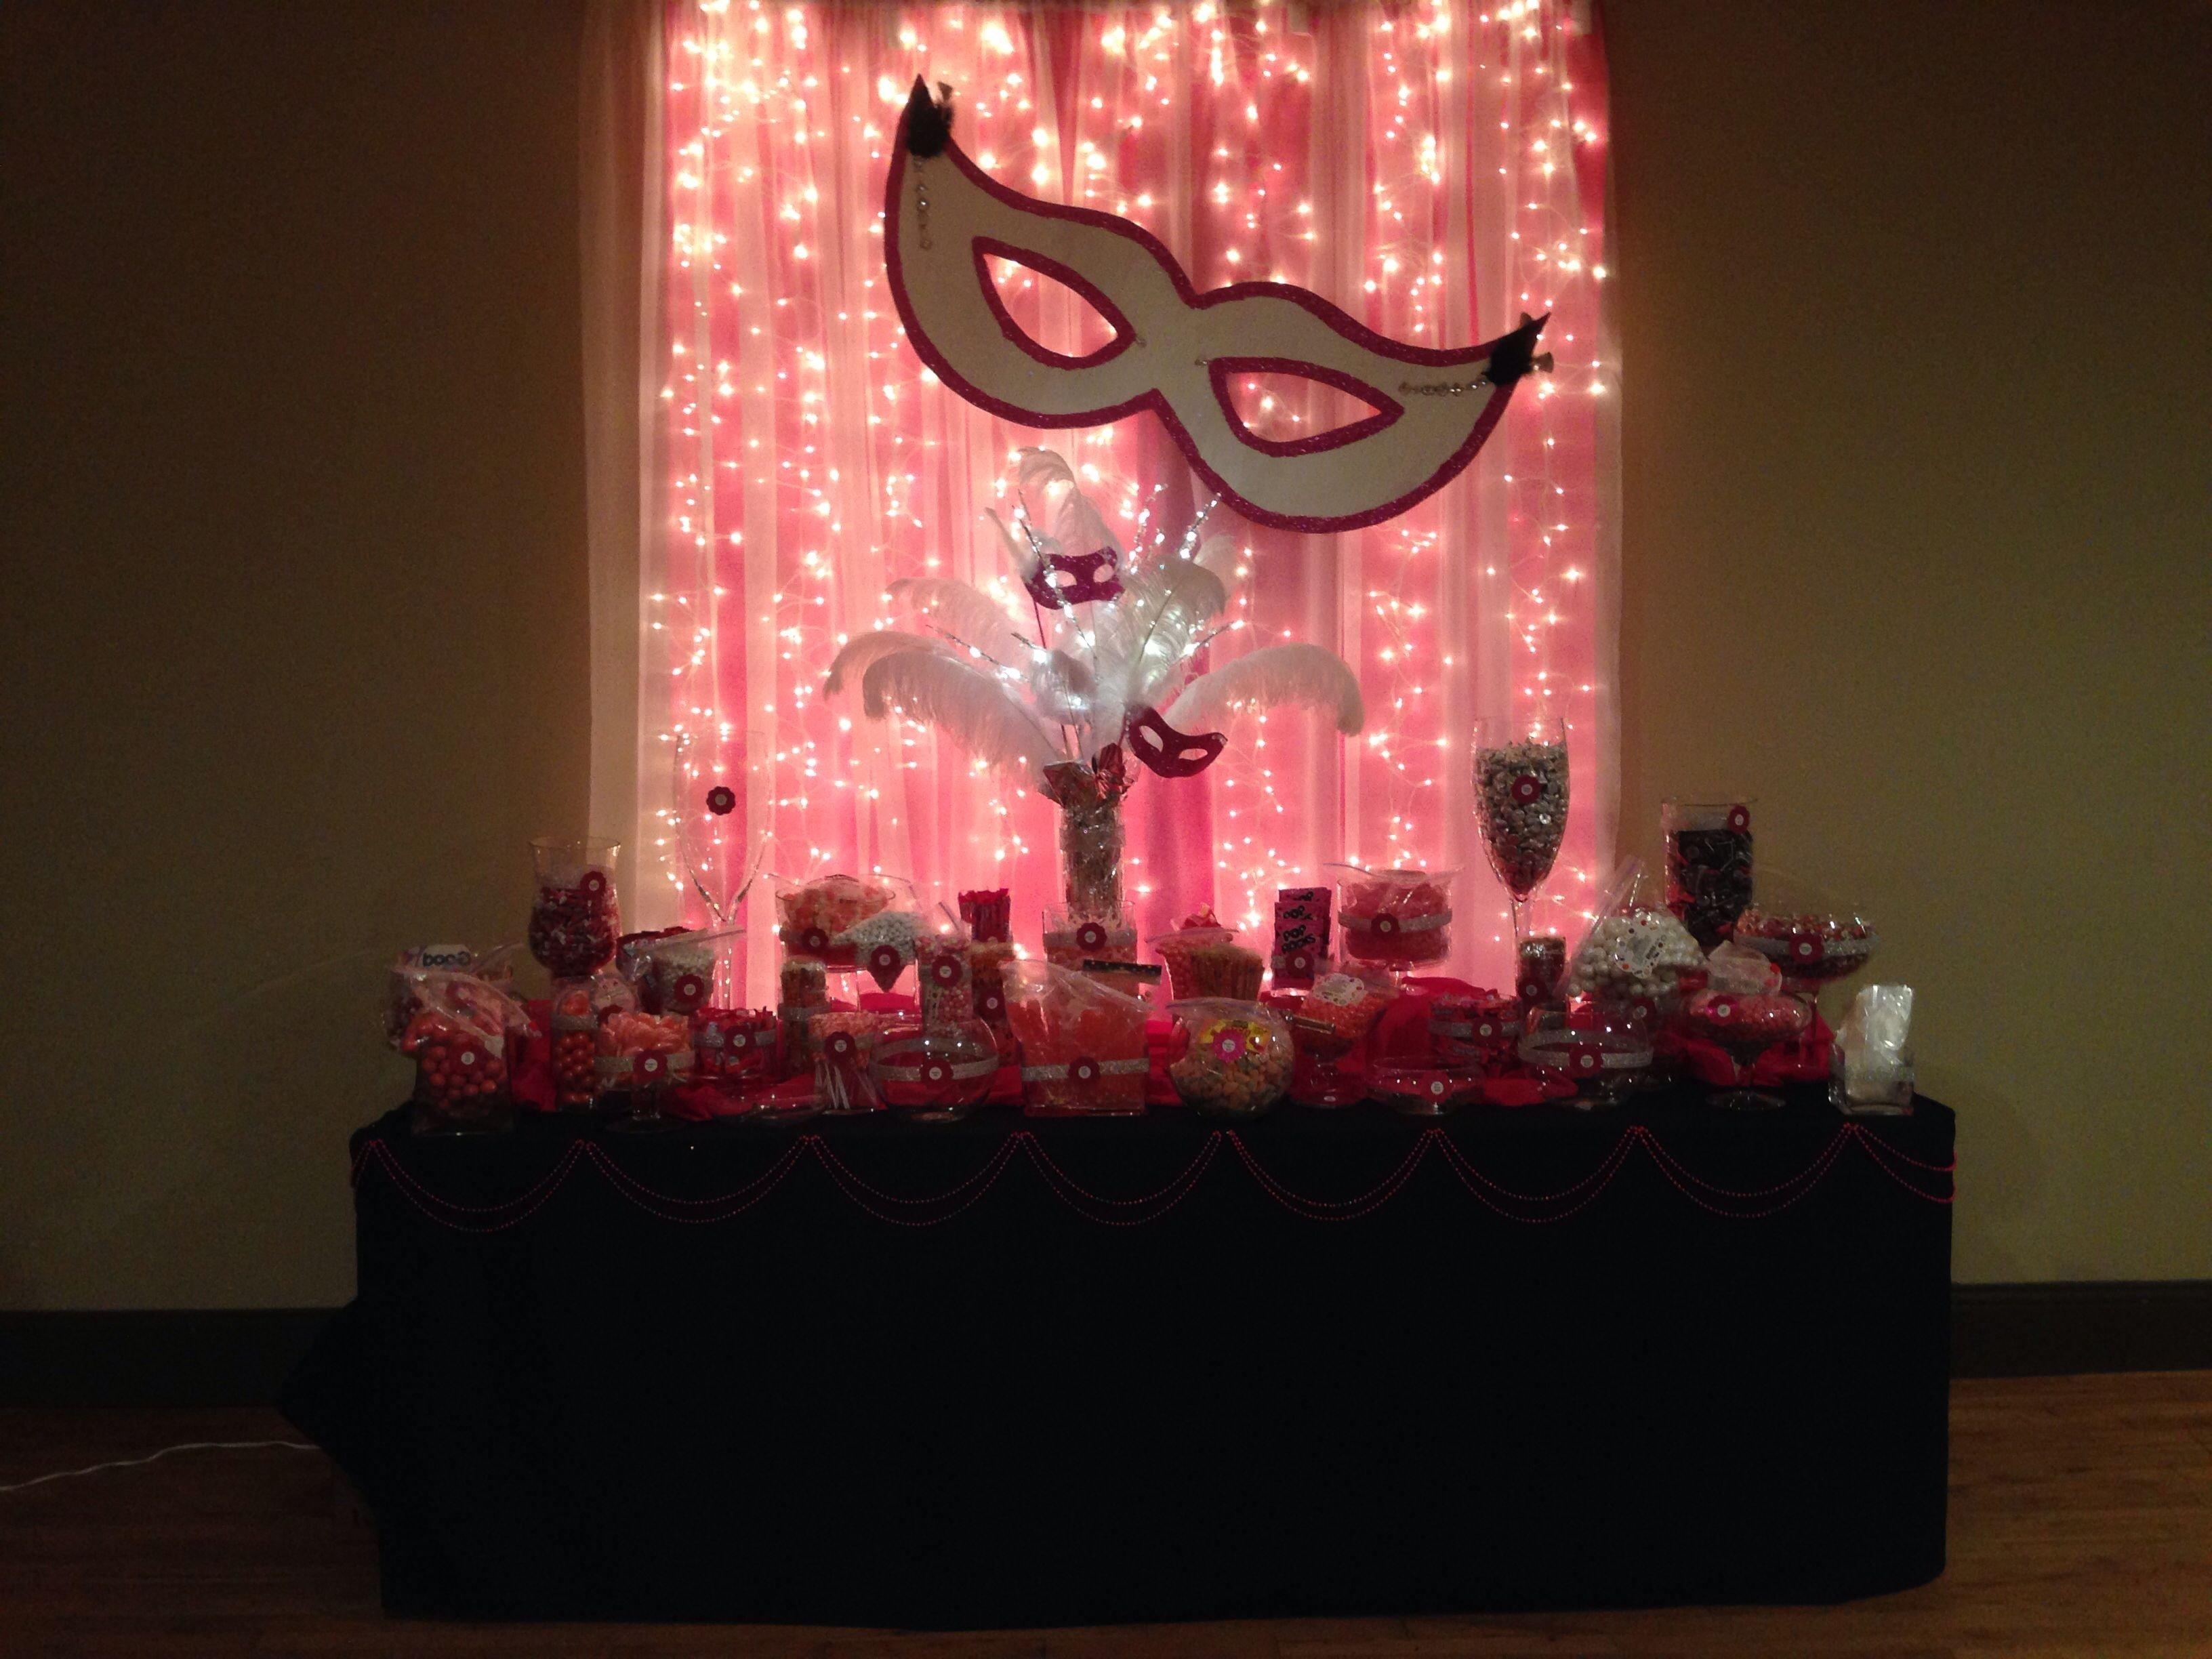 10 Elegant Masquerade Party Ideas Sweet 16 masquerade party candy table party ideas pinterest masquerade 2020